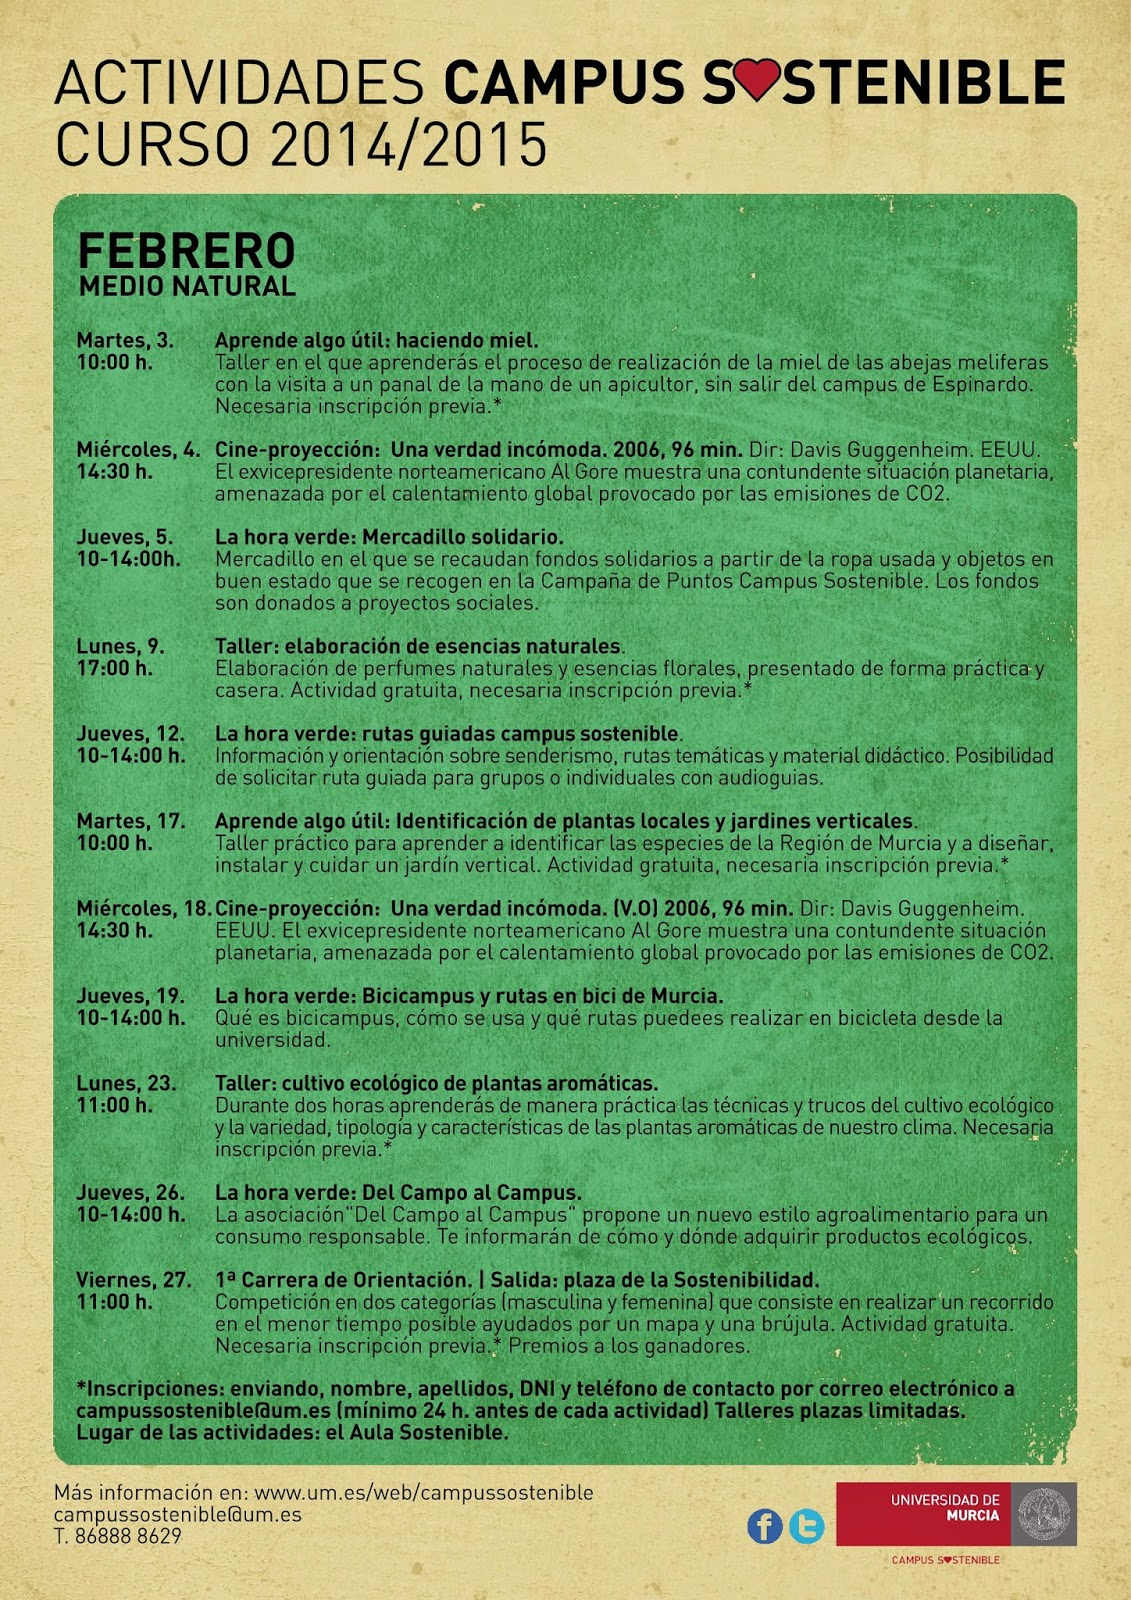 Actividades de Febrero